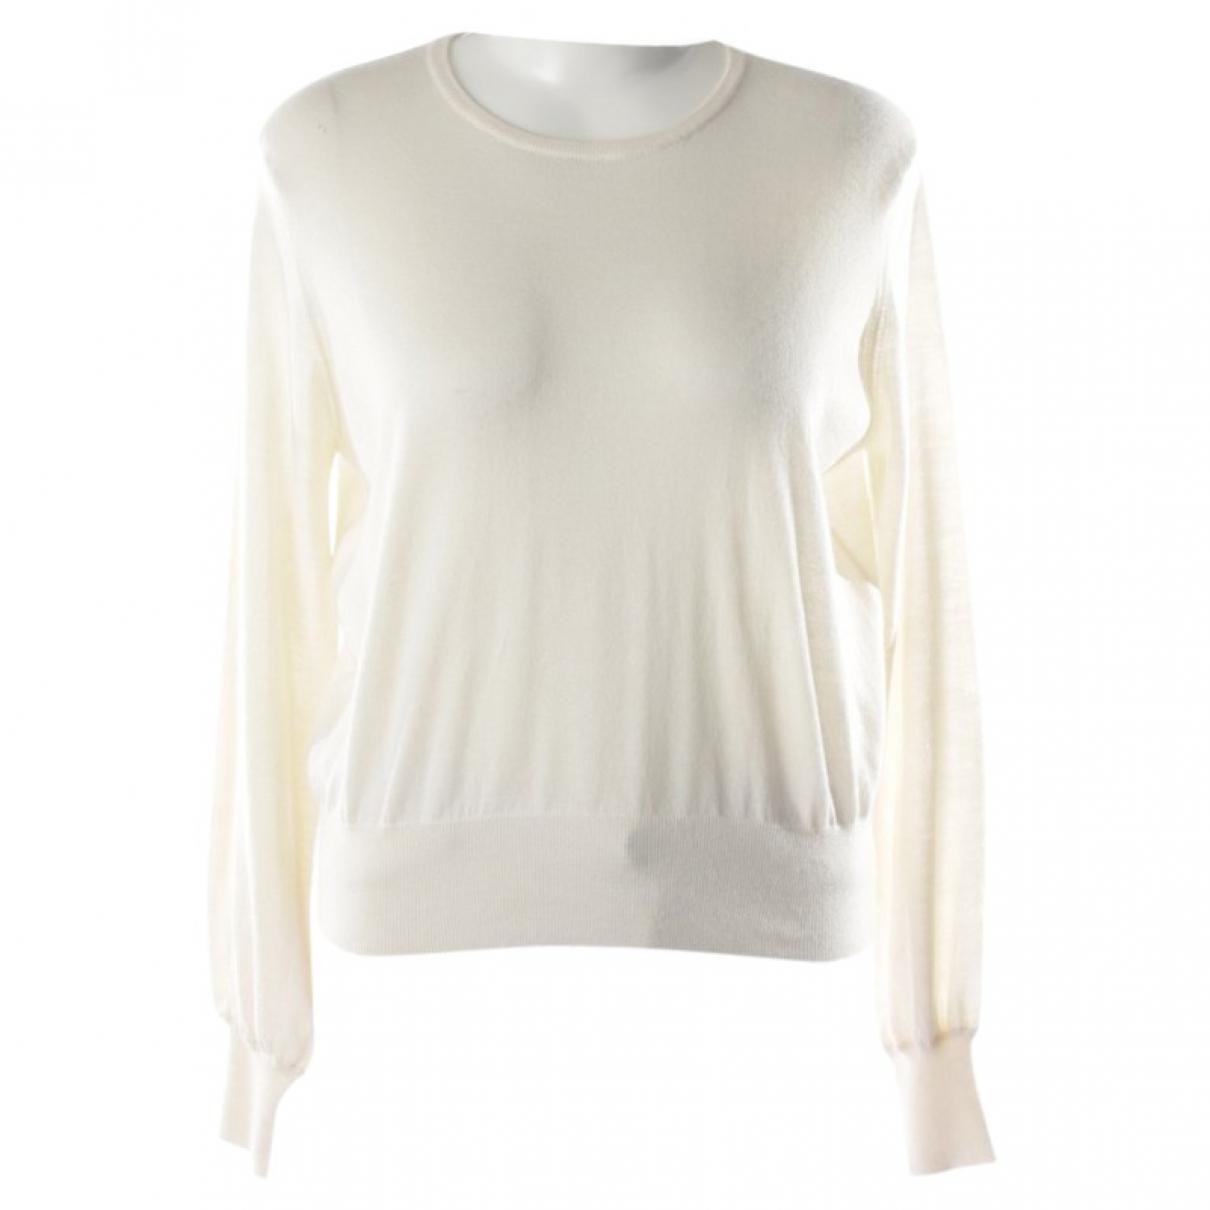 Autre Marque \N White Cashmere Knitwear for Women S International